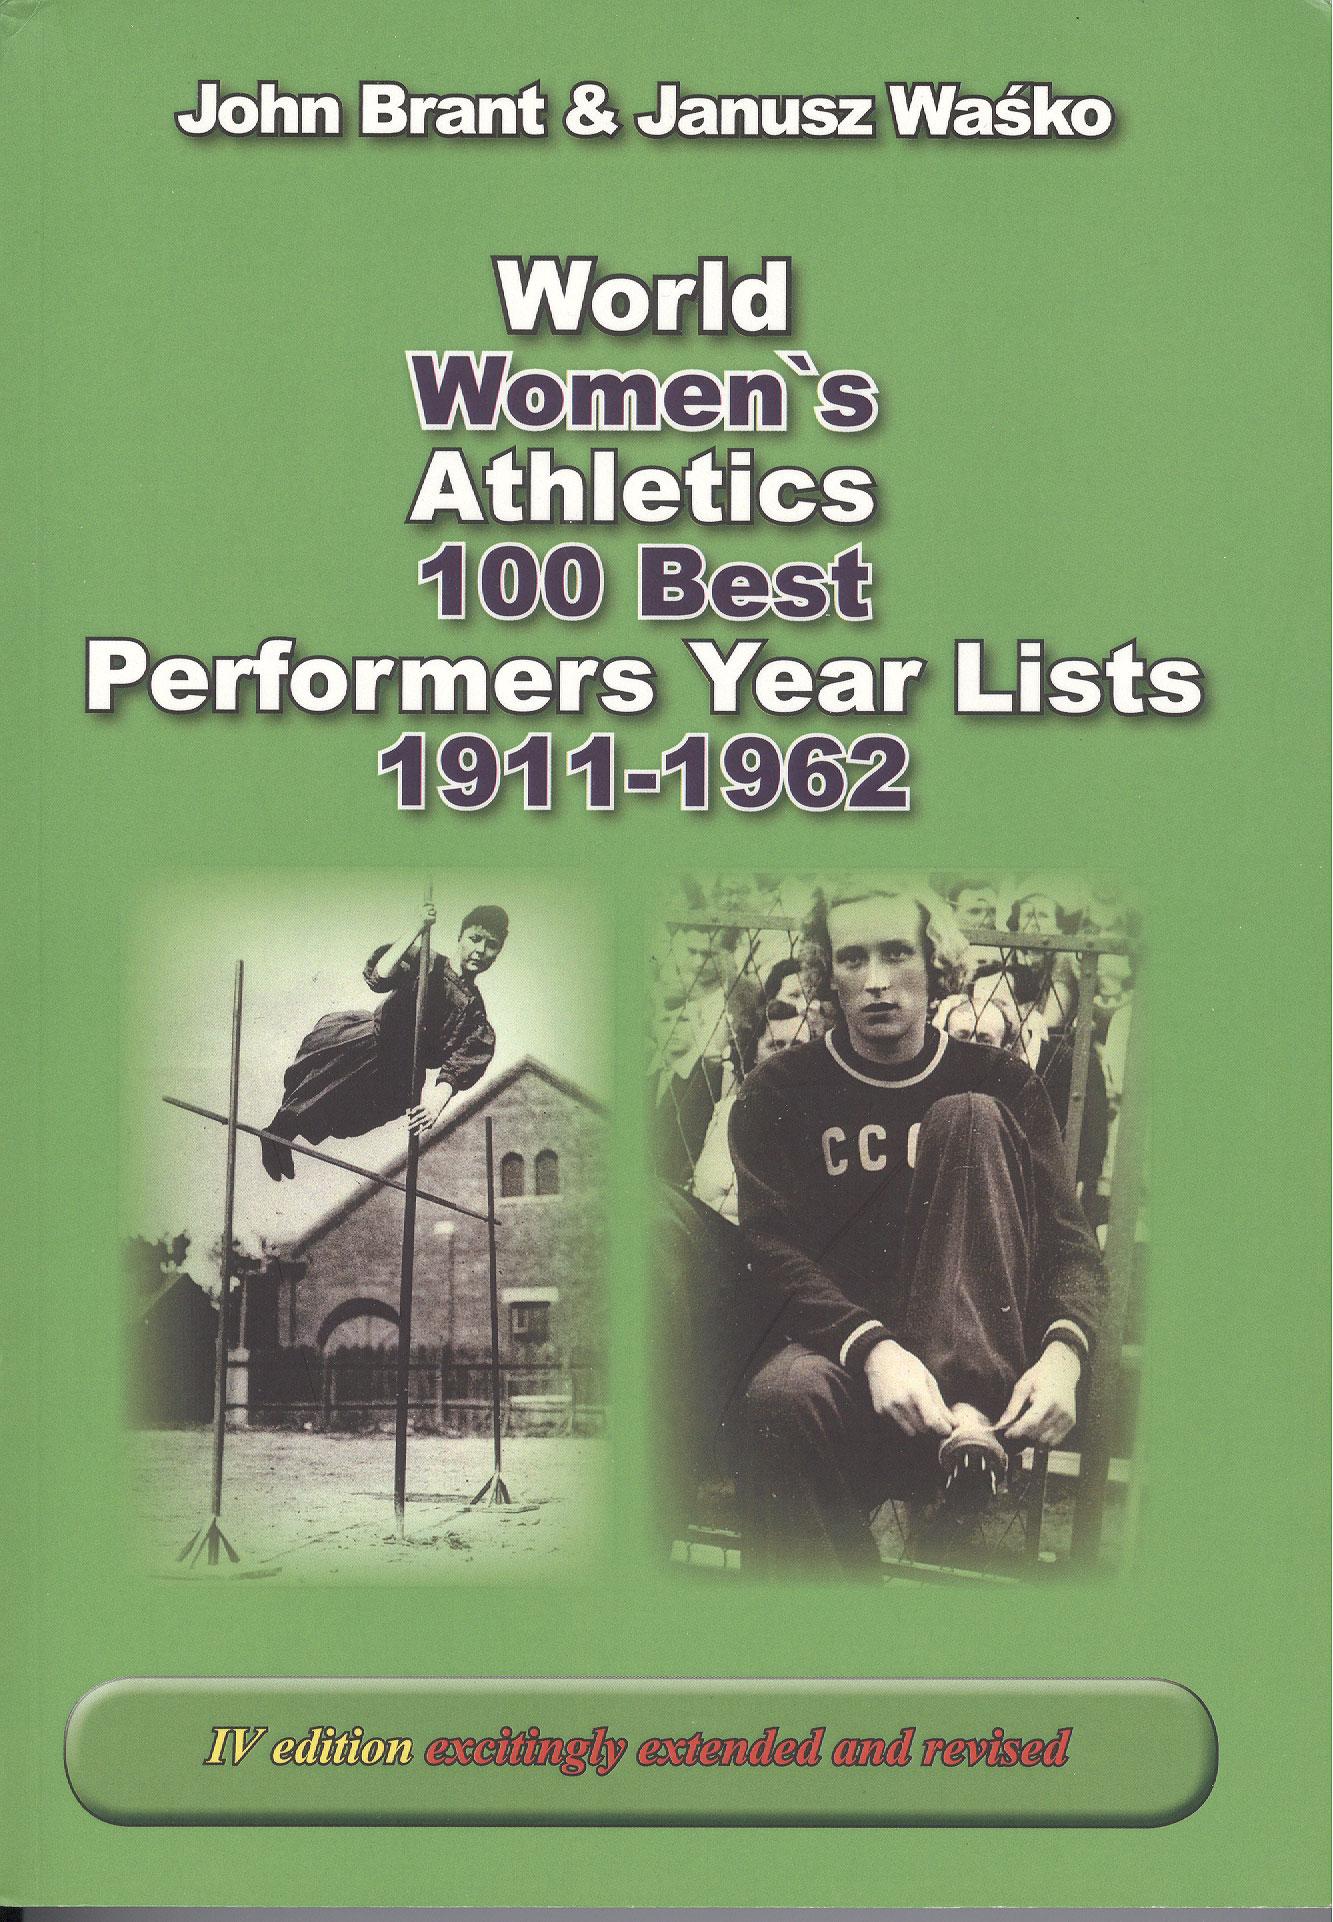 World-Womens-Best-cover